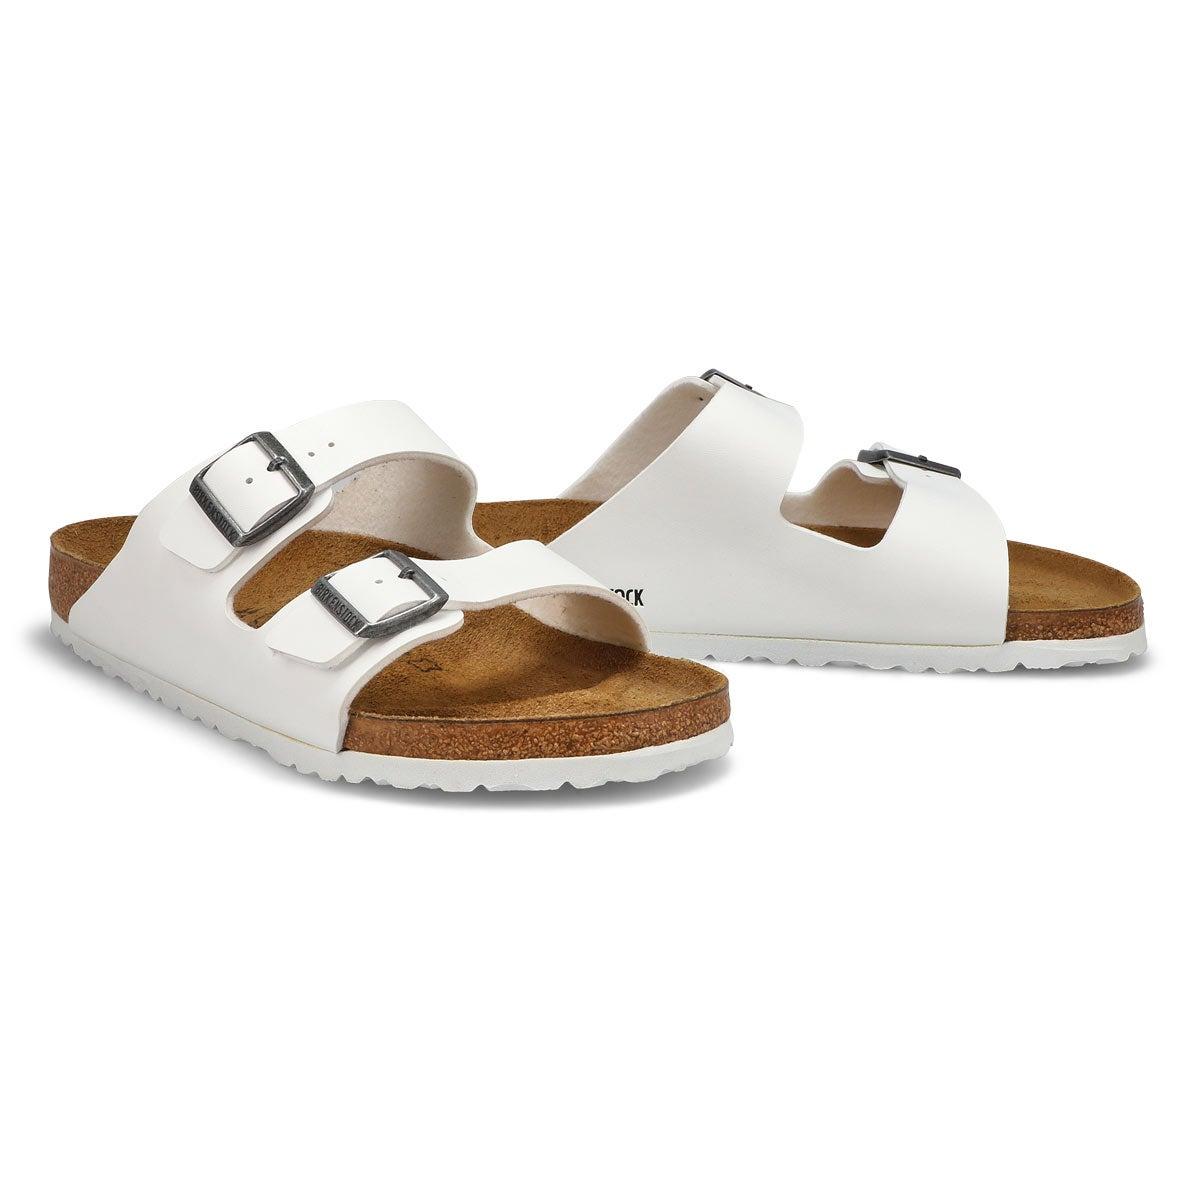 Men's Arizona BF Sandal - White